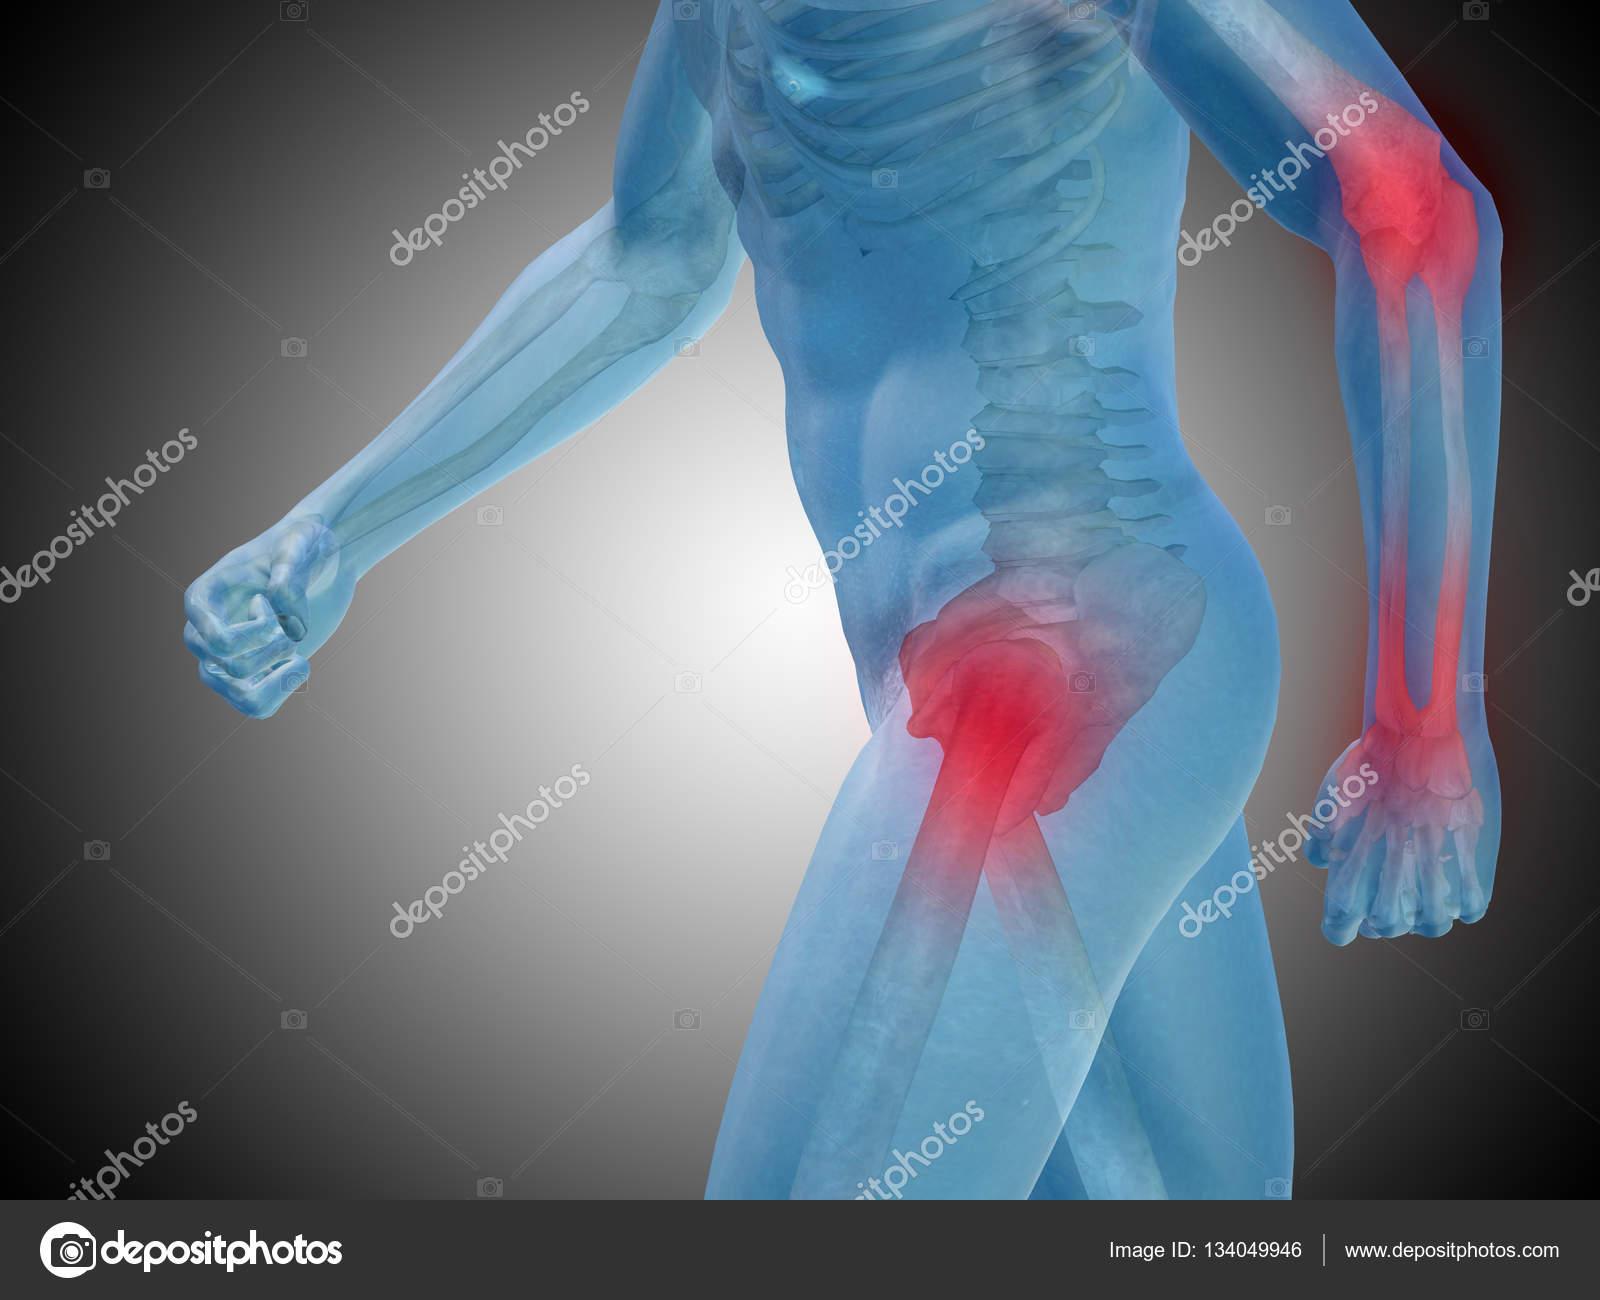 anatomía humana sobre fondo gris — Foto de stock © design36 #134049946